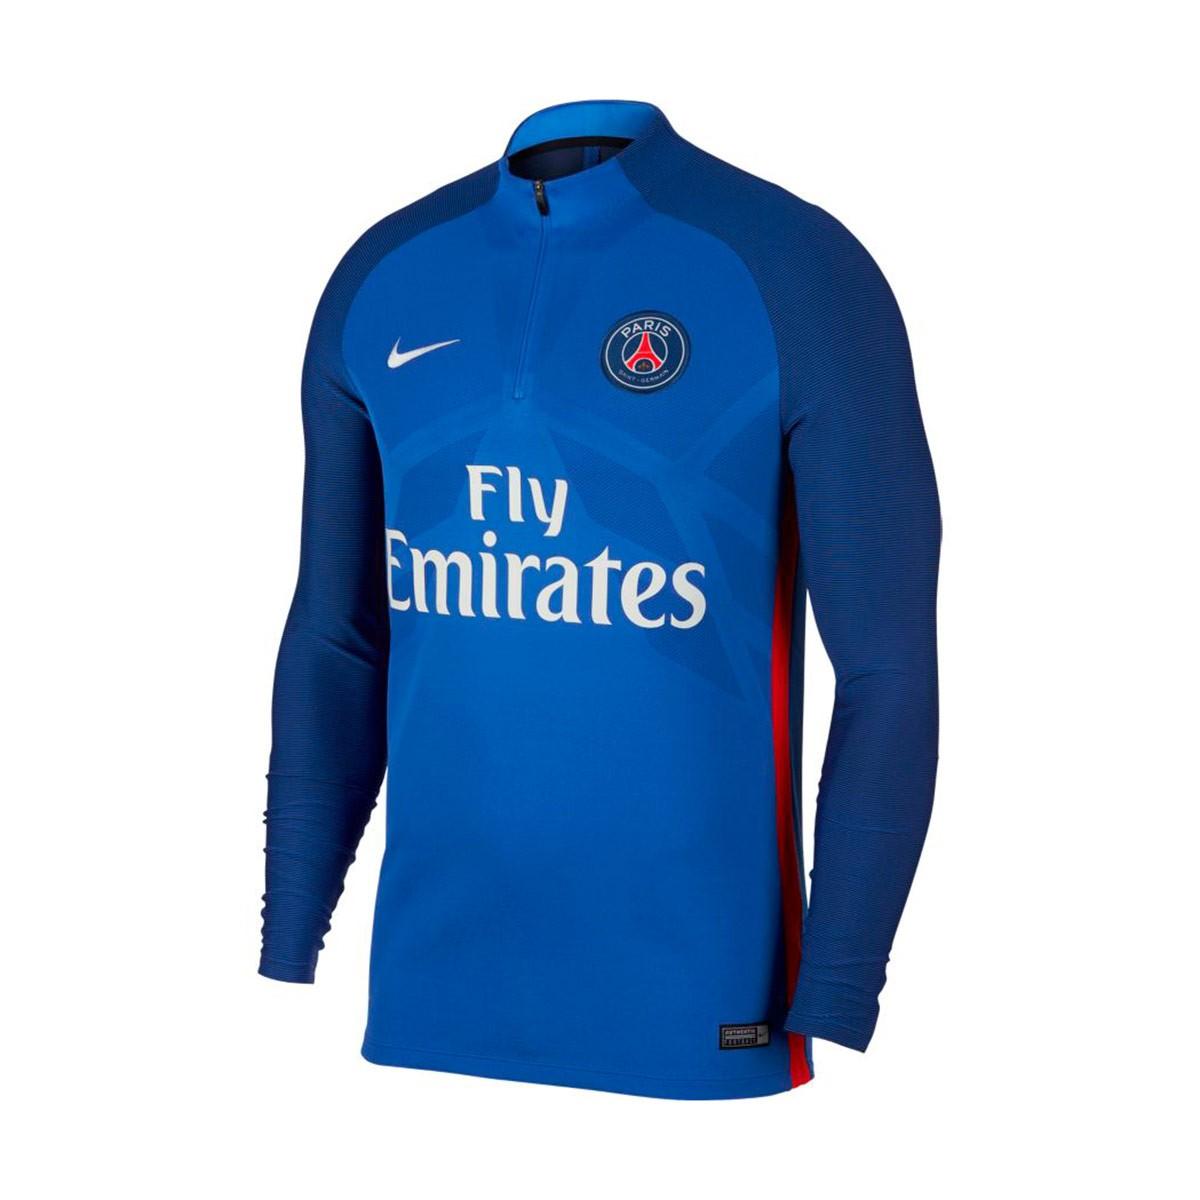 55dd90b68b Sweatshirt Nike Paris Saint-Germain Aeroswift Strike Dril Top 2017 ...